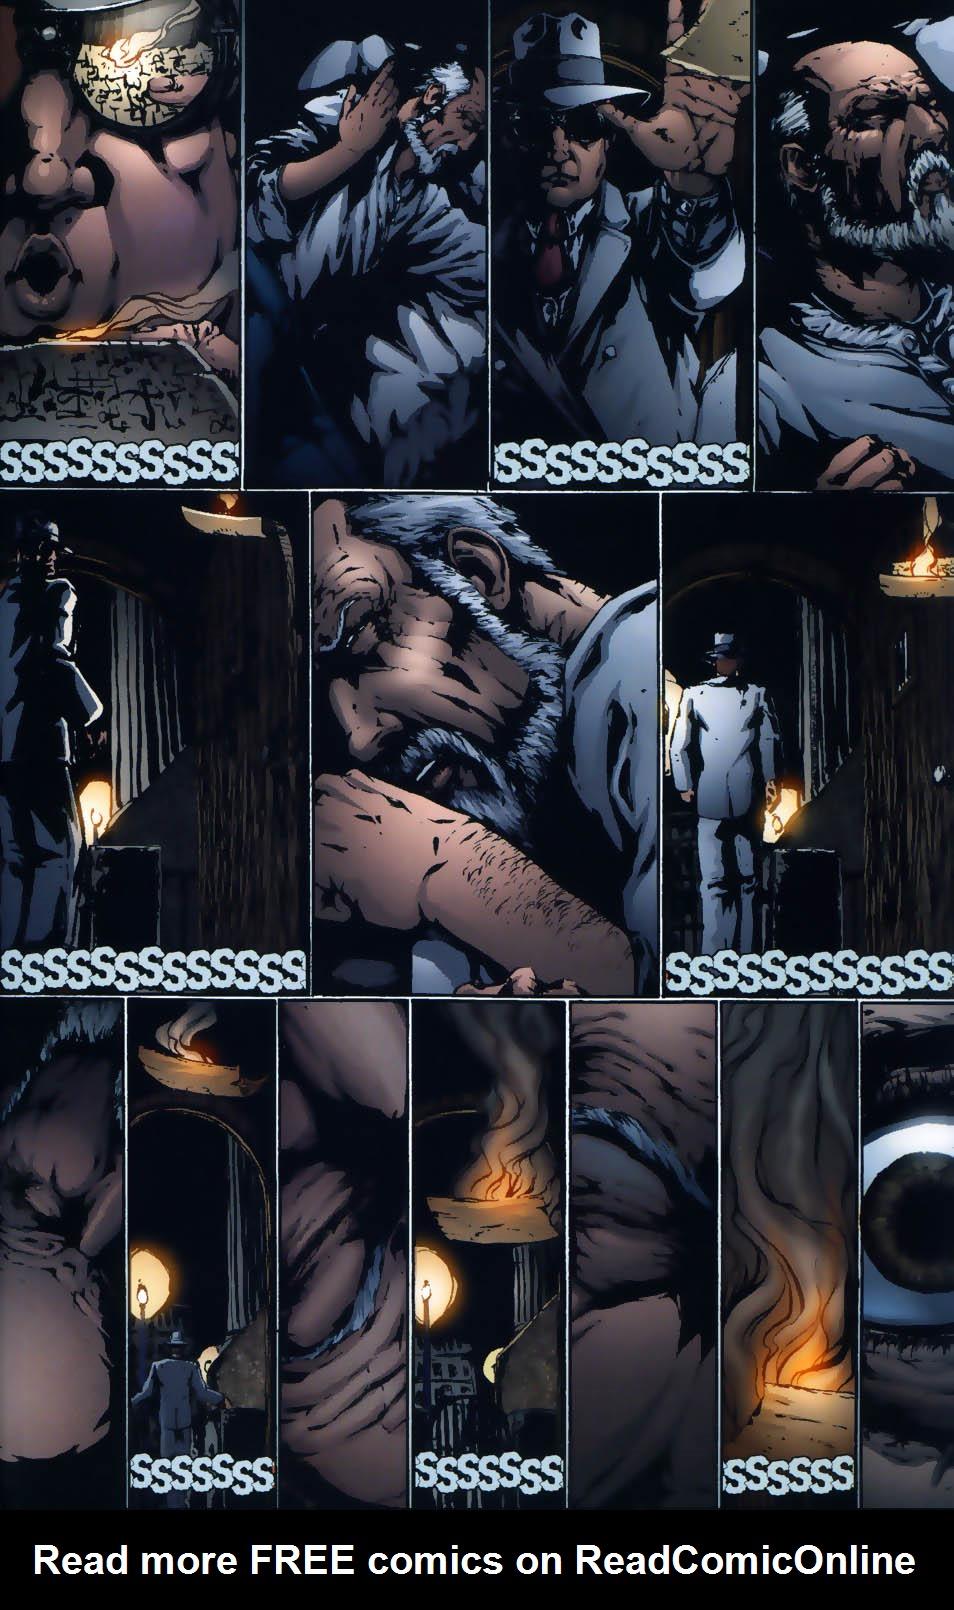 Read online Rex Mundi comic -  Issue #1 - 22